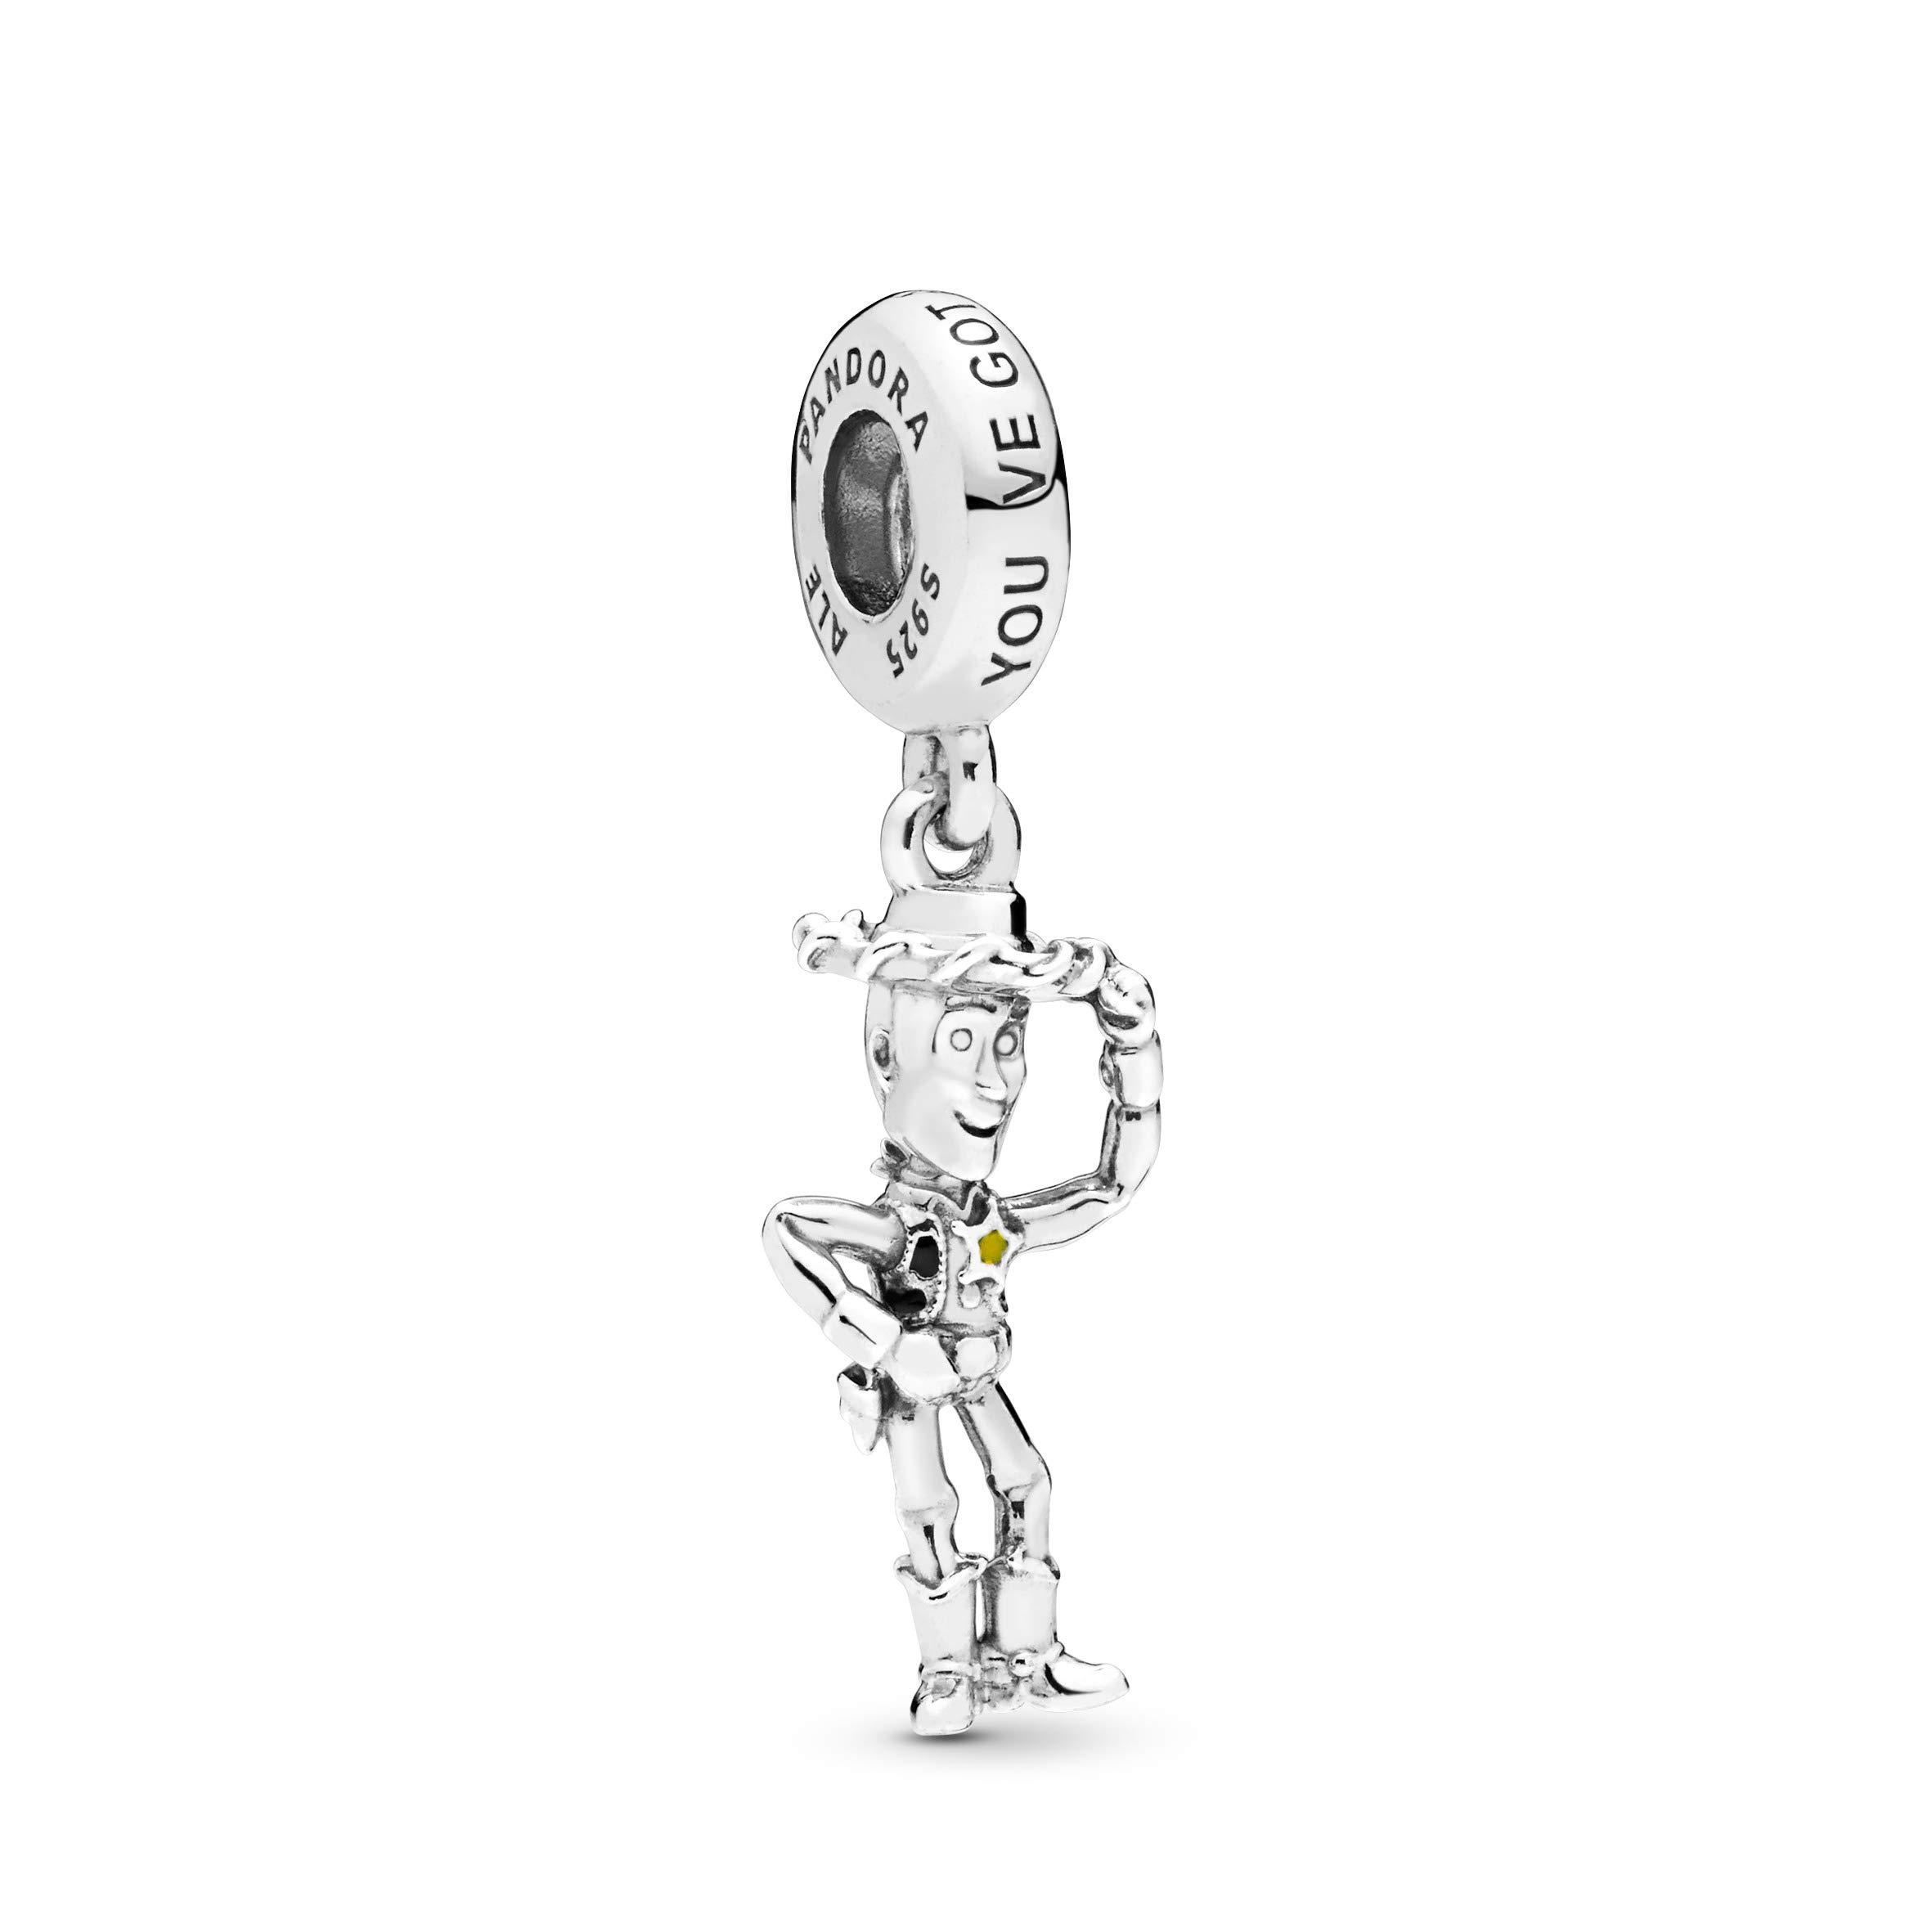 PANDORA Disney Pixar, Toy Story, Woody 925 Sterling Silver Charm - 798041ENMX by PANDORA